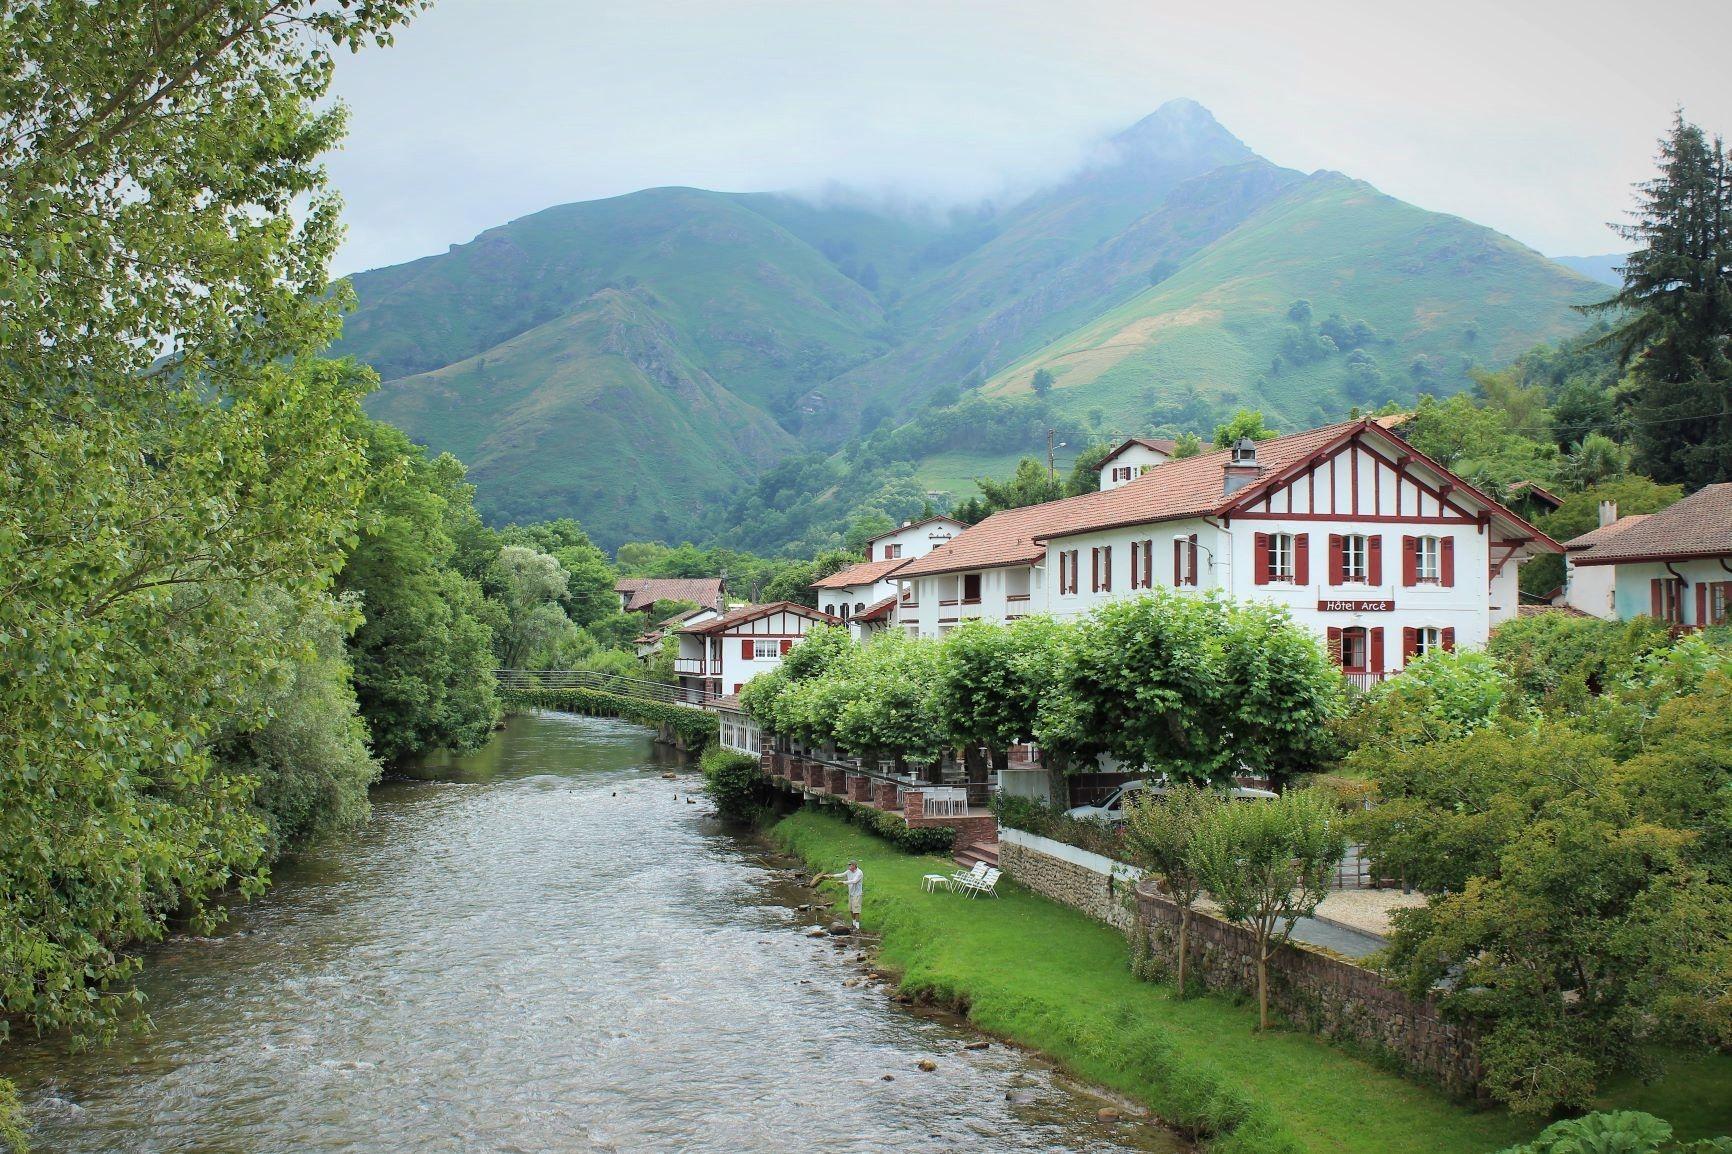 Pa s vasco franc s en 2 d as ruta por la francia desconocida un planeta por viajar - Casas rurales pais vasco frances ...